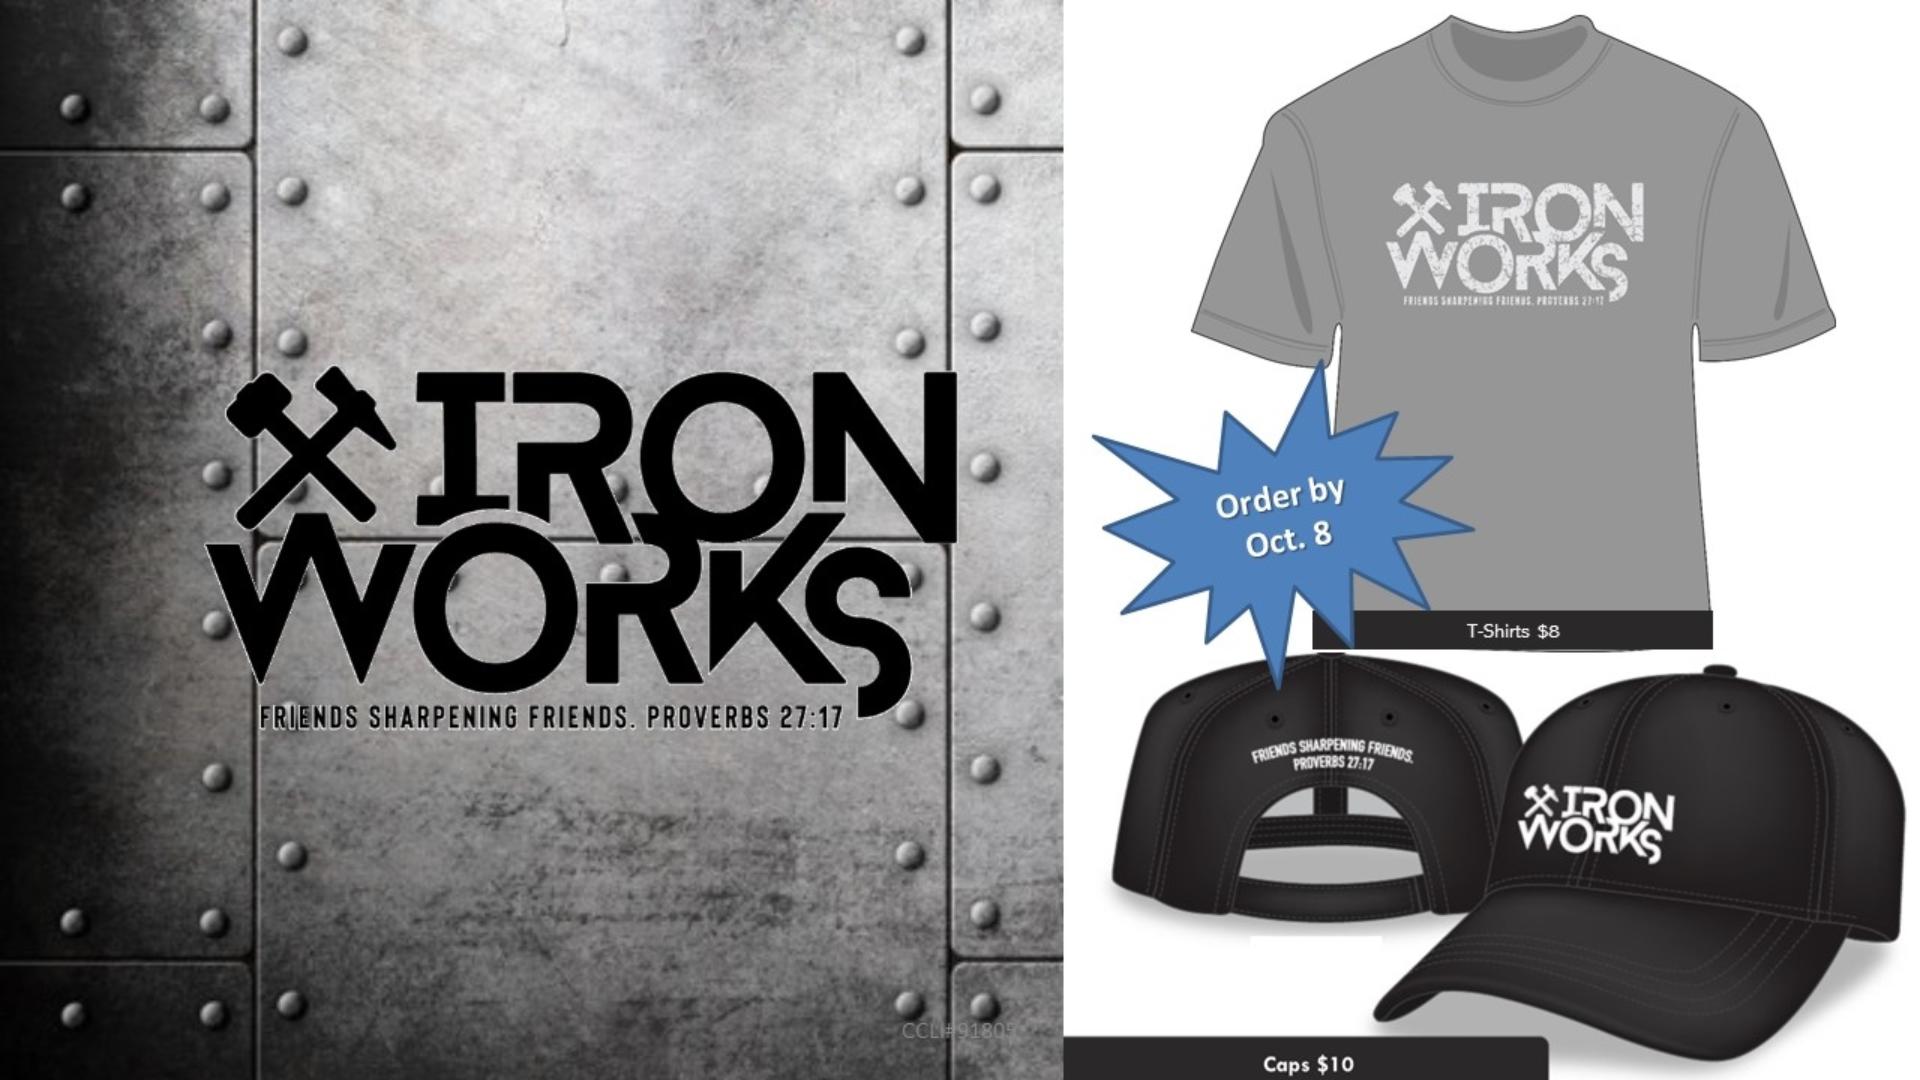 ironworks shirts & cap.png